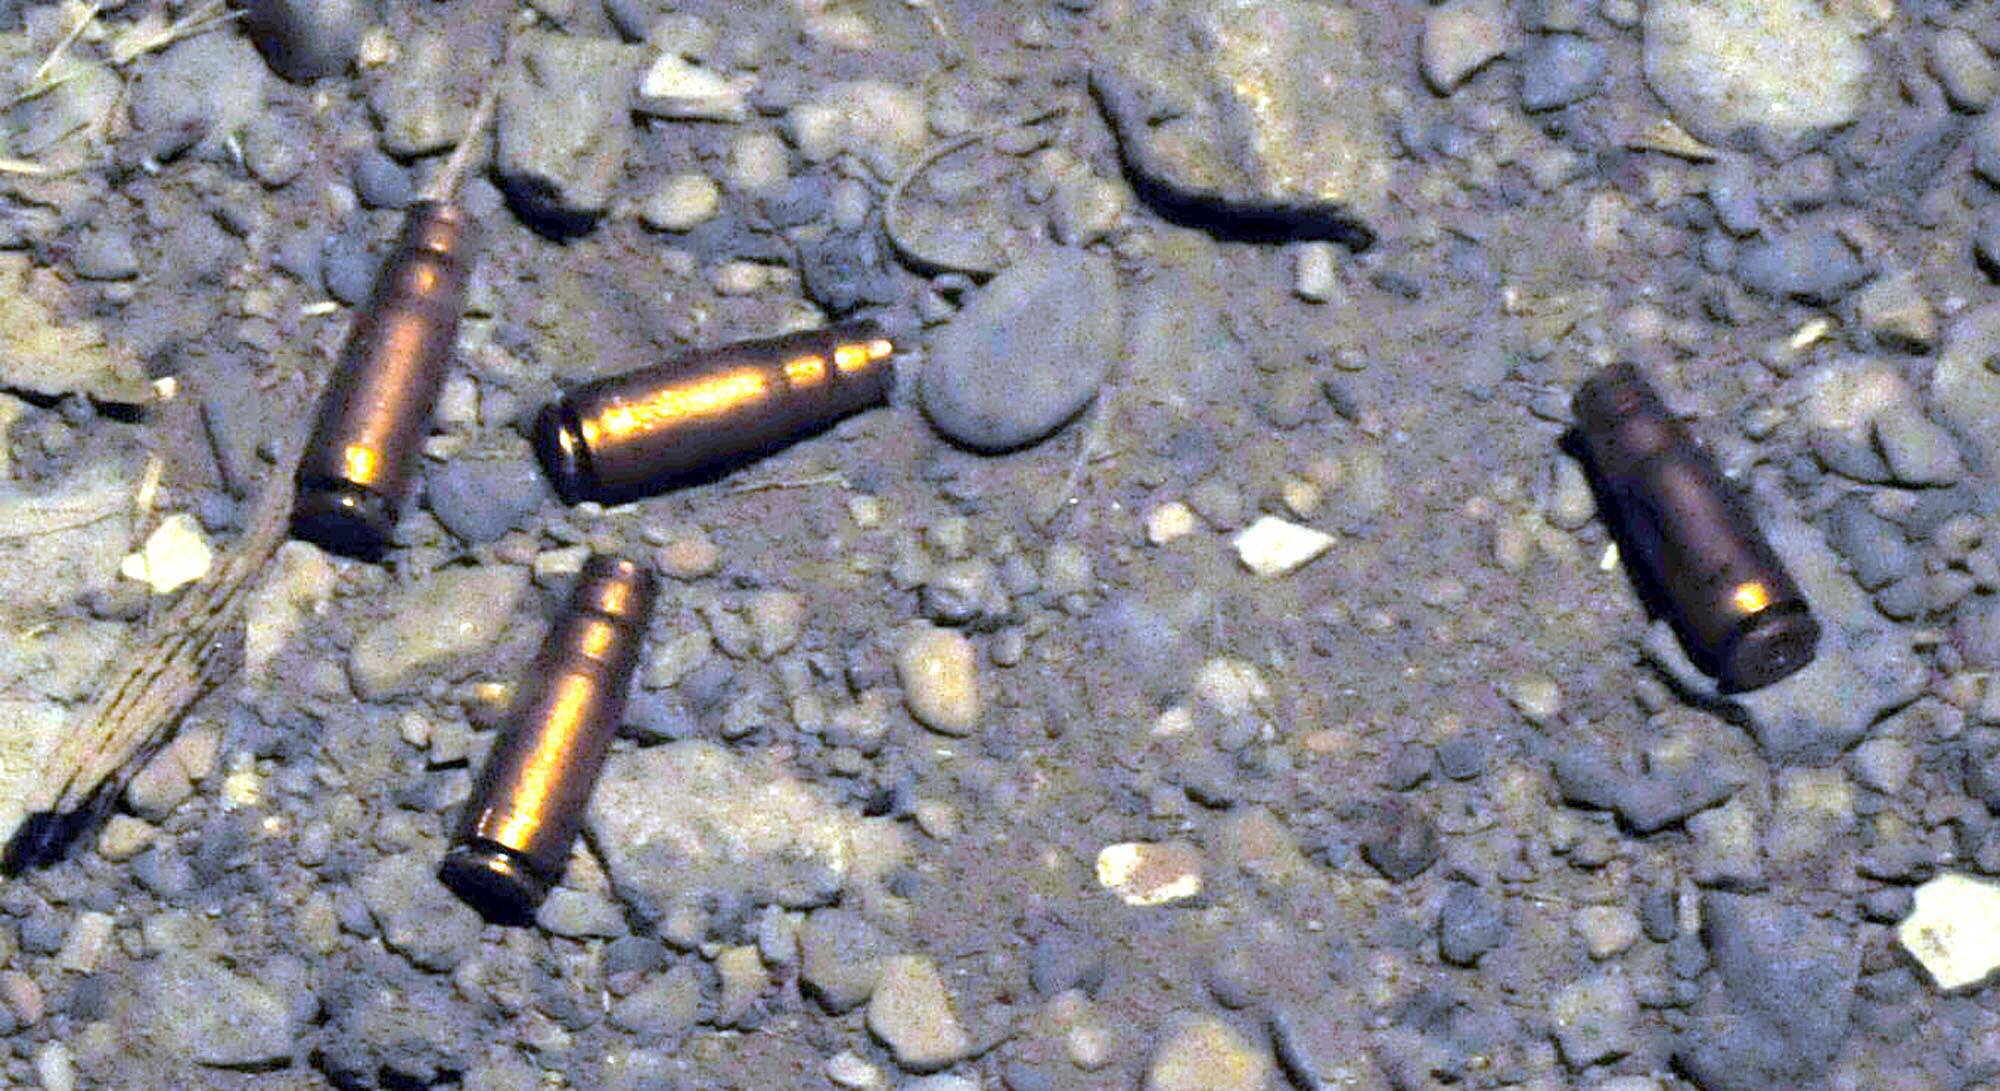 illicit relations 20 year old boy found dead